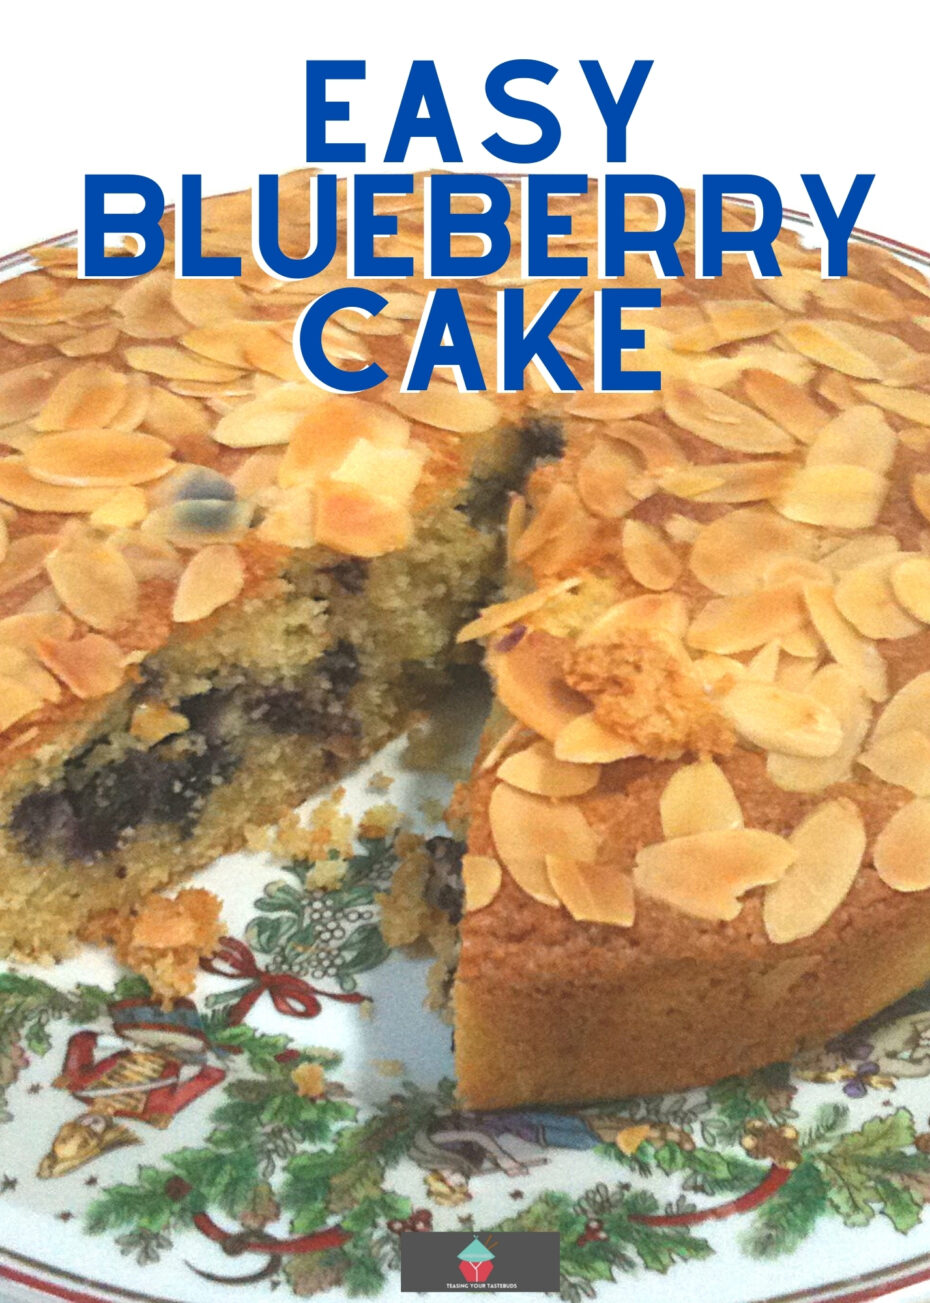 Easy Blueberry CakeH